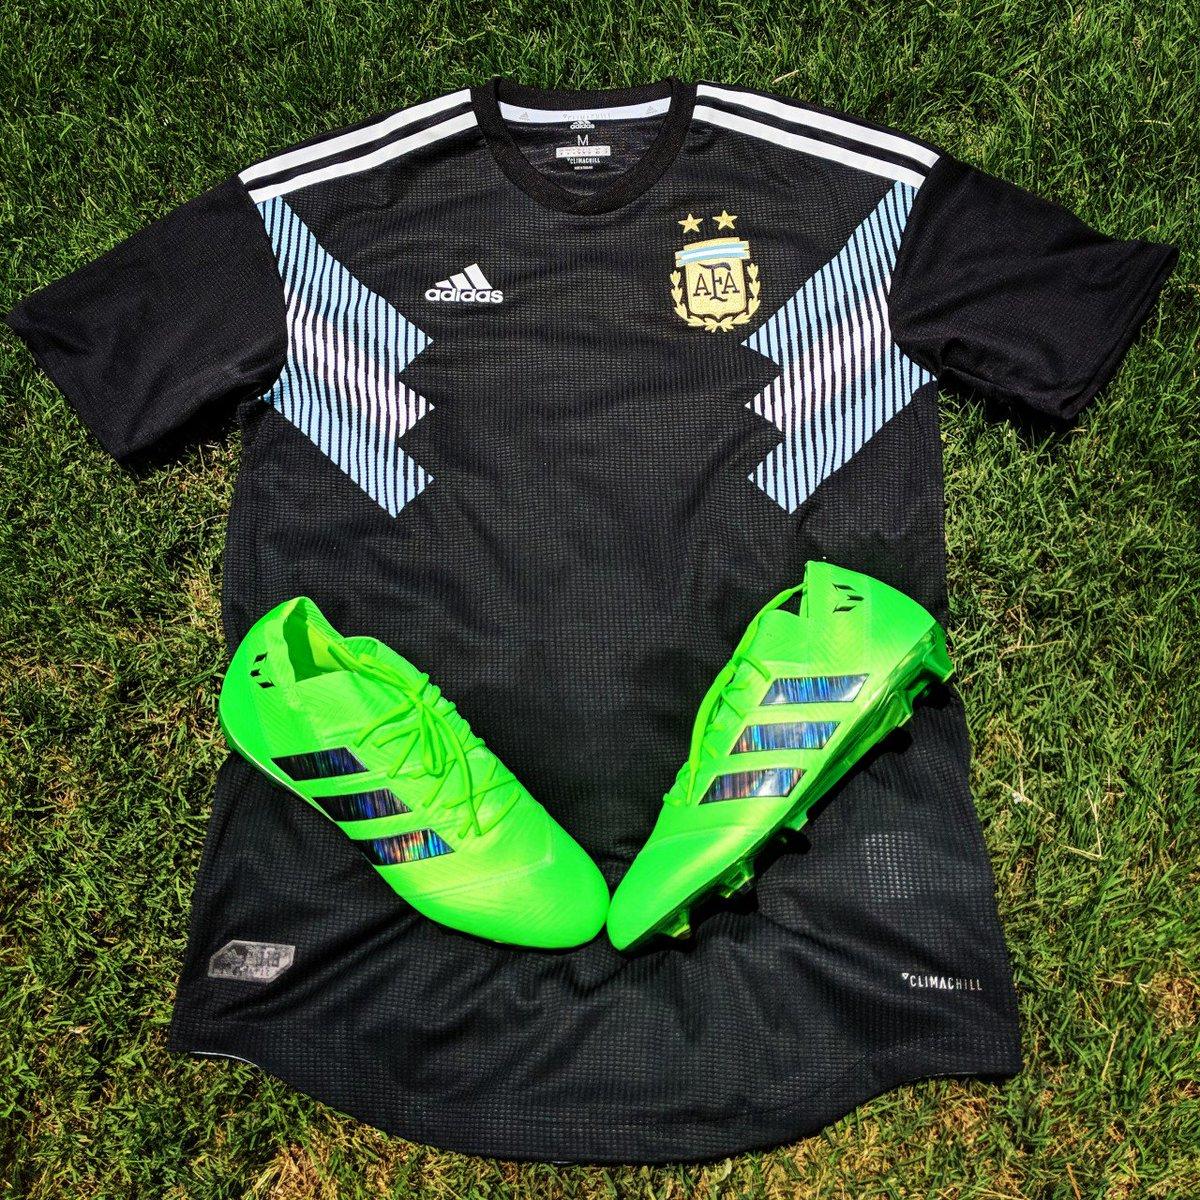 223de2286 World Soccer Shop on Twitter: